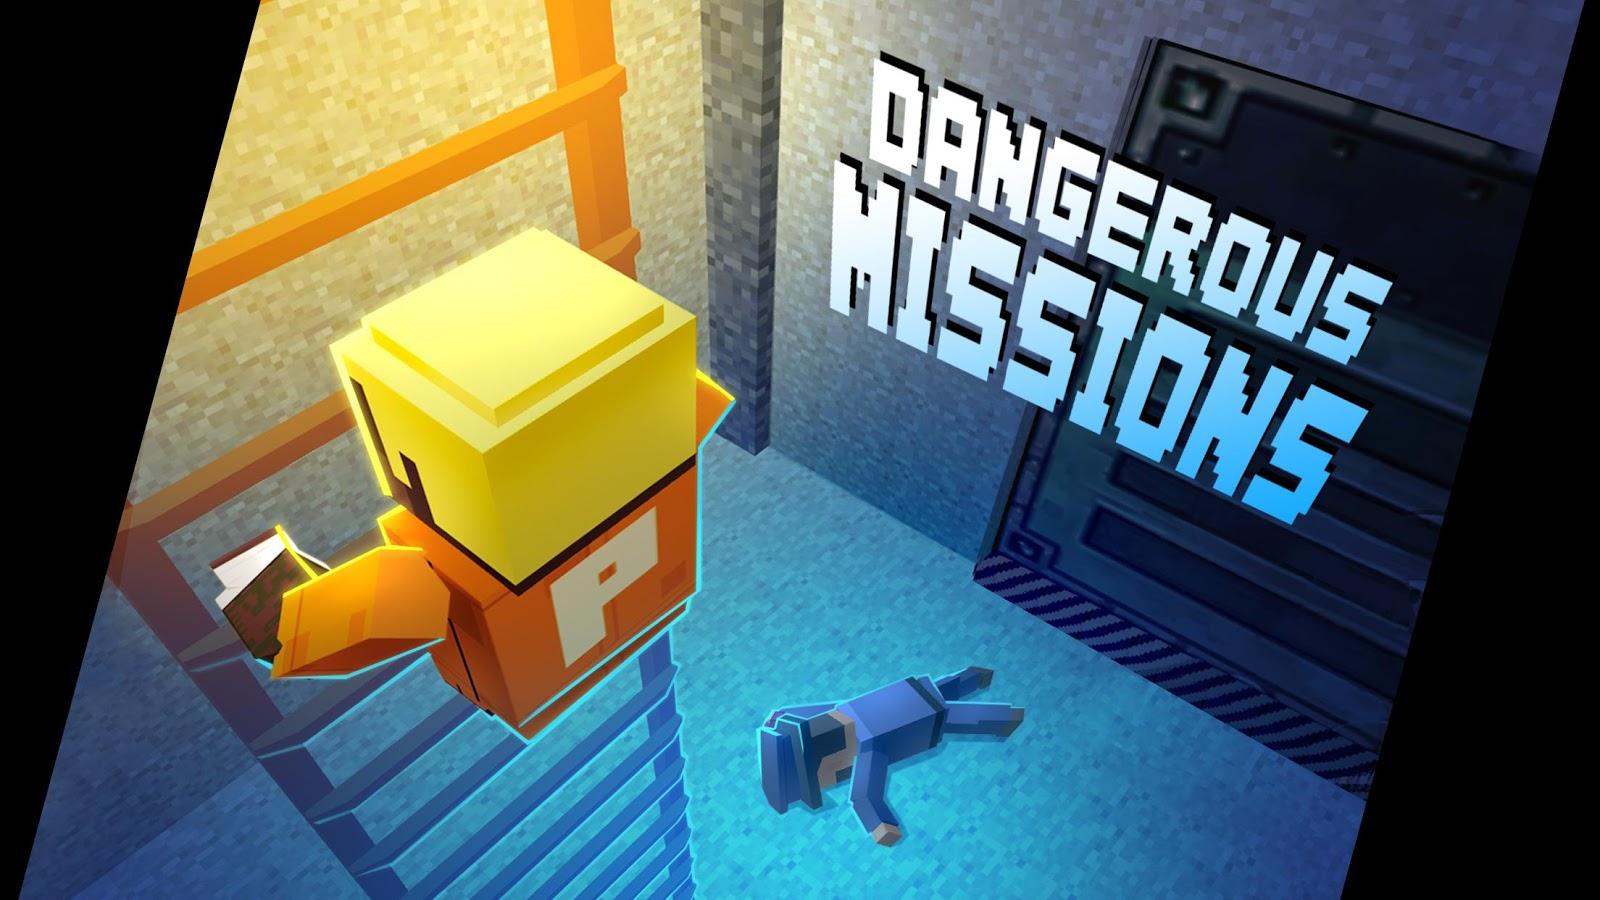 Alcatraz Pixel Prison Heist Gangster Escape Room MOD apk